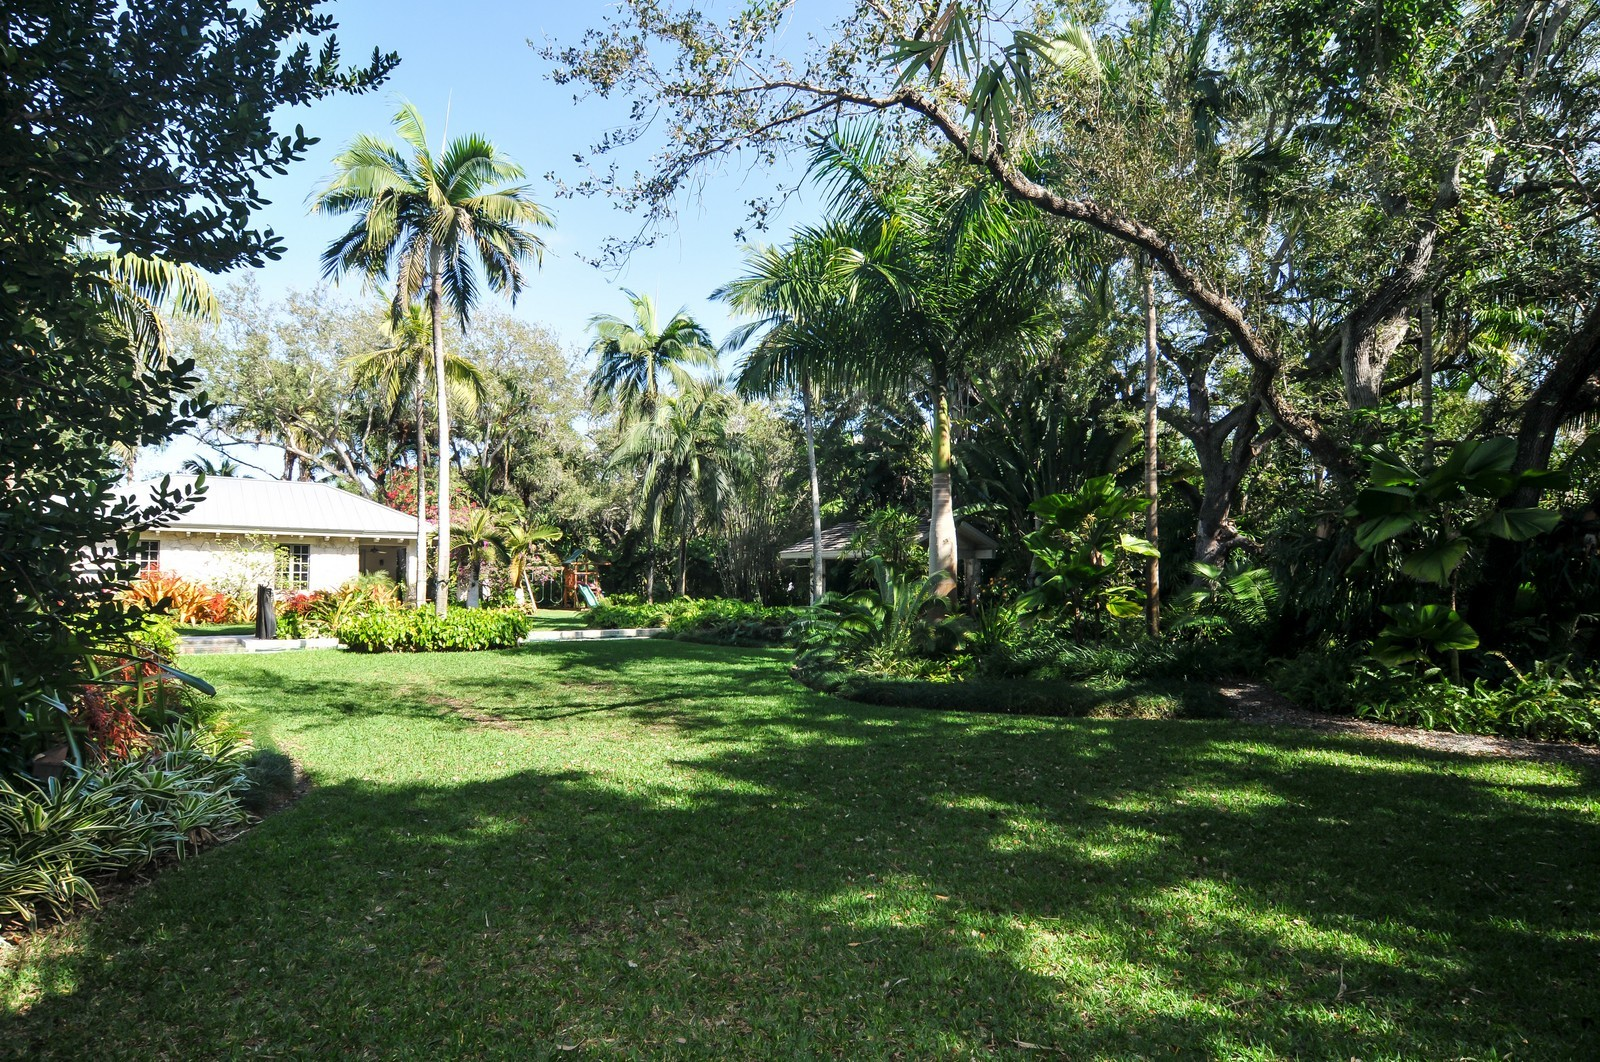 Real Estate Photography - 10225 Coral Creek Rd, Coral Gables, FL, 33156 - Garden